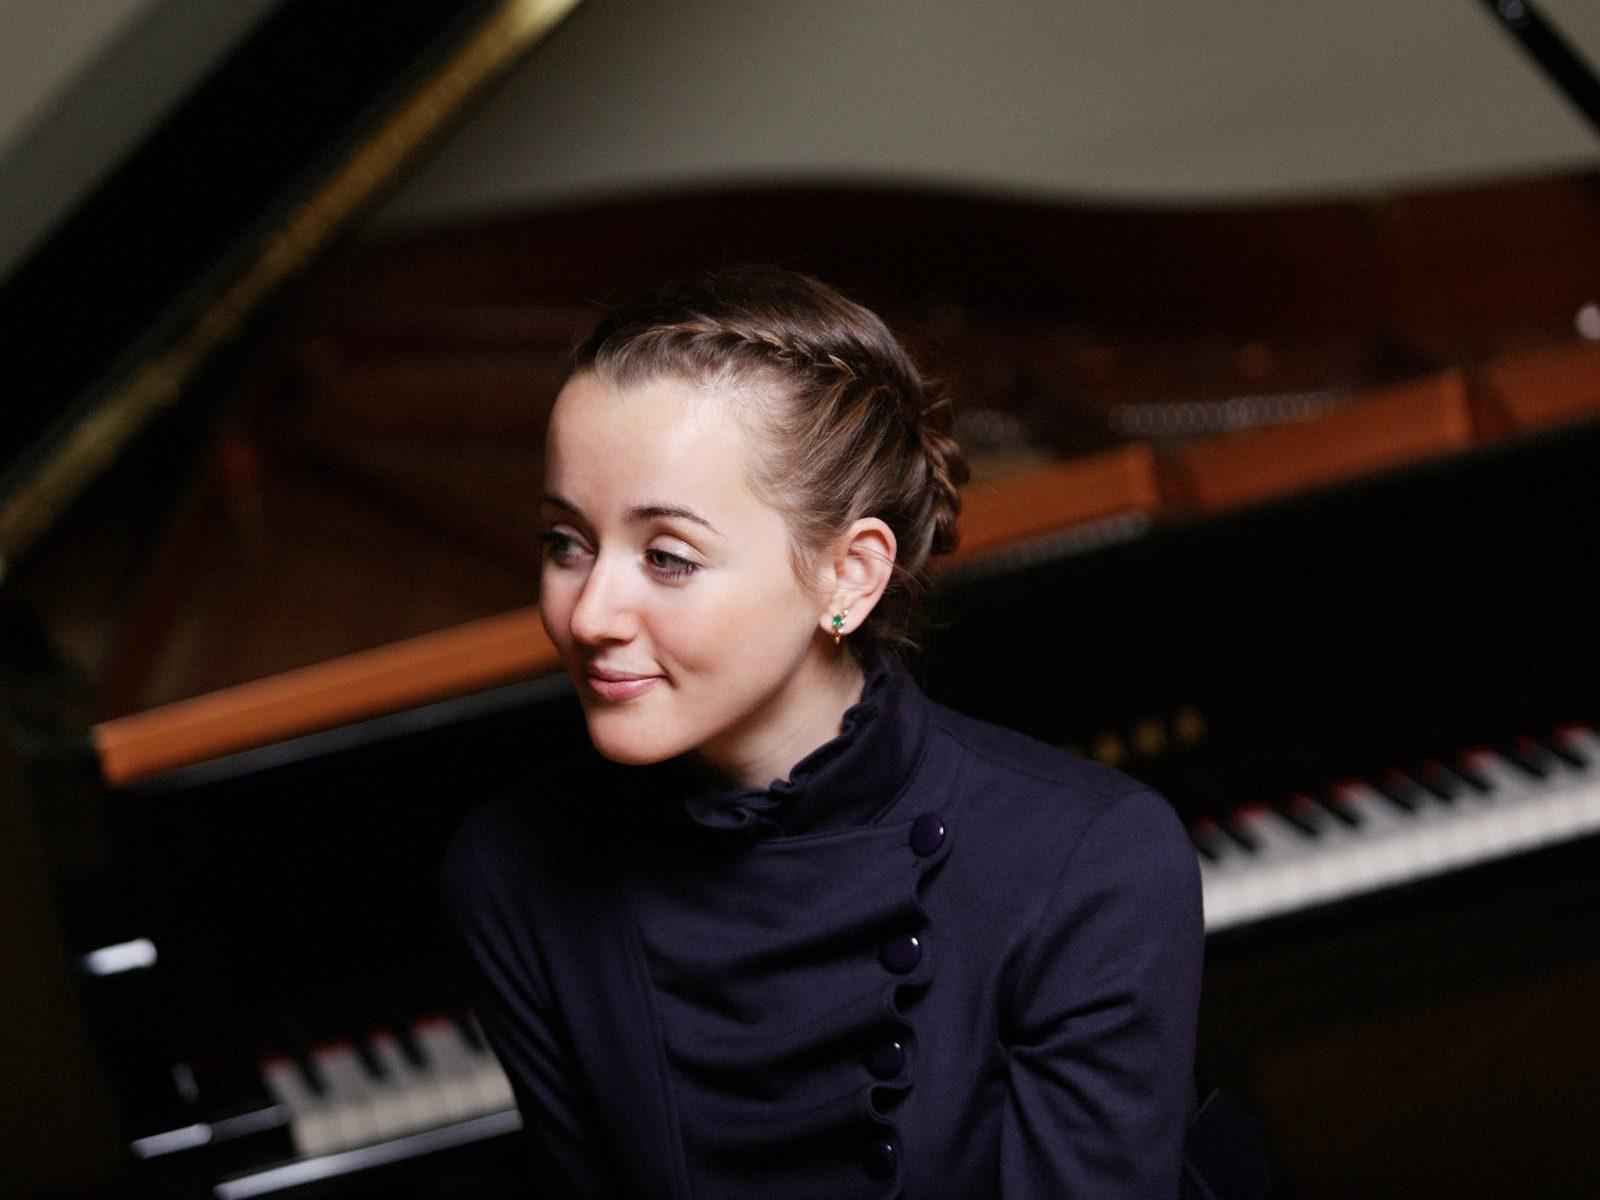 Internationally Acclaimed Pianist: Oxana Shevchenko, Bunbury, Western Australia